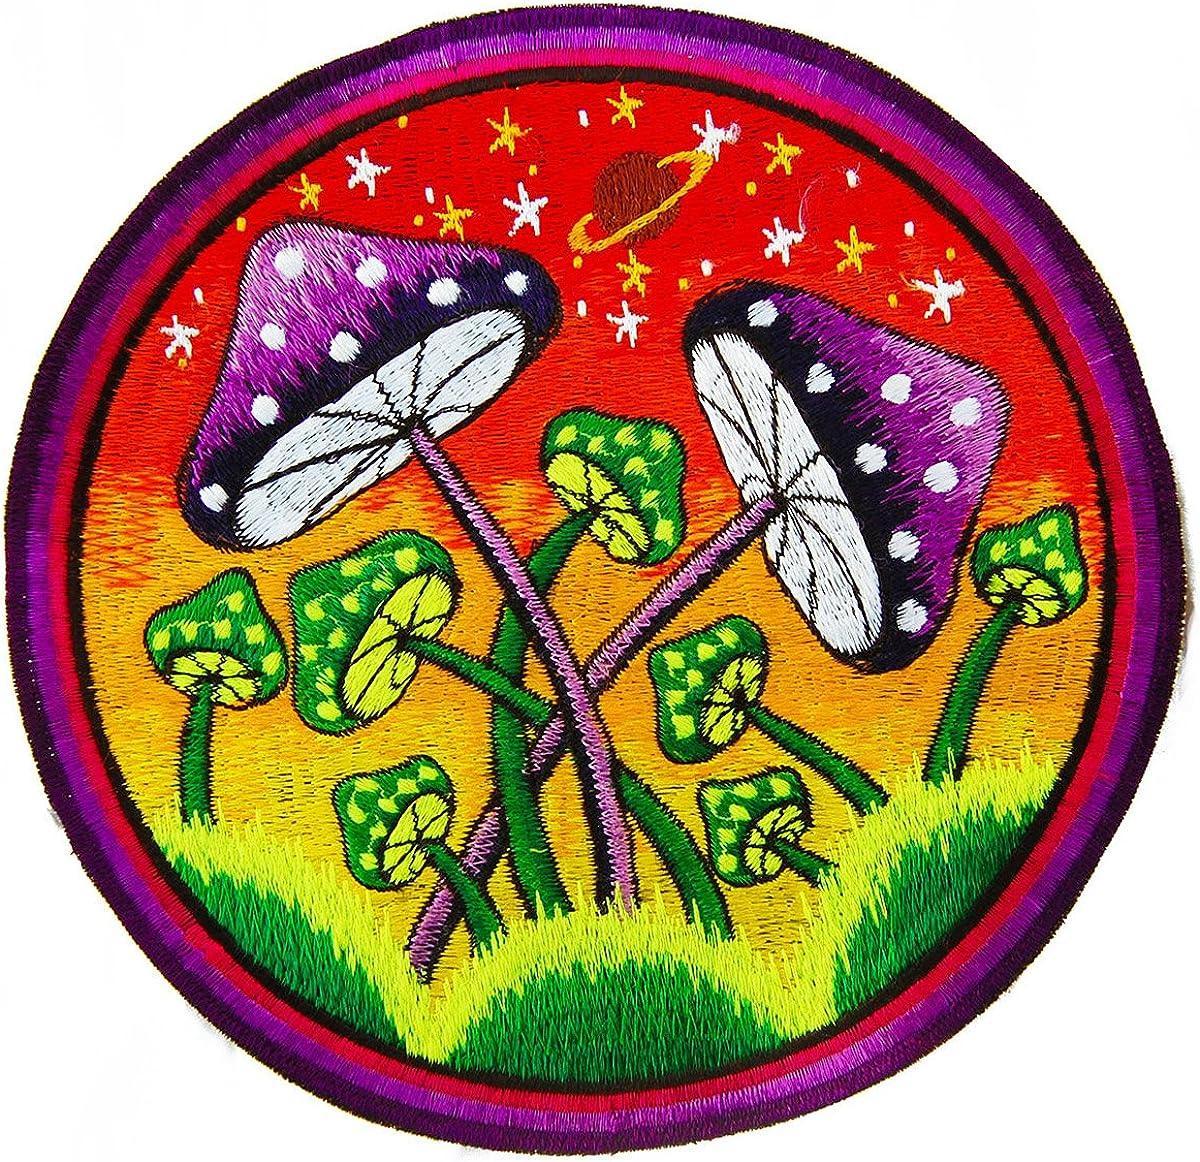 imzauber Bosque Mushroom Planet parche (20cm, Negro Luz activo, handgestickt sin PC) mágica Seta Goa Patch